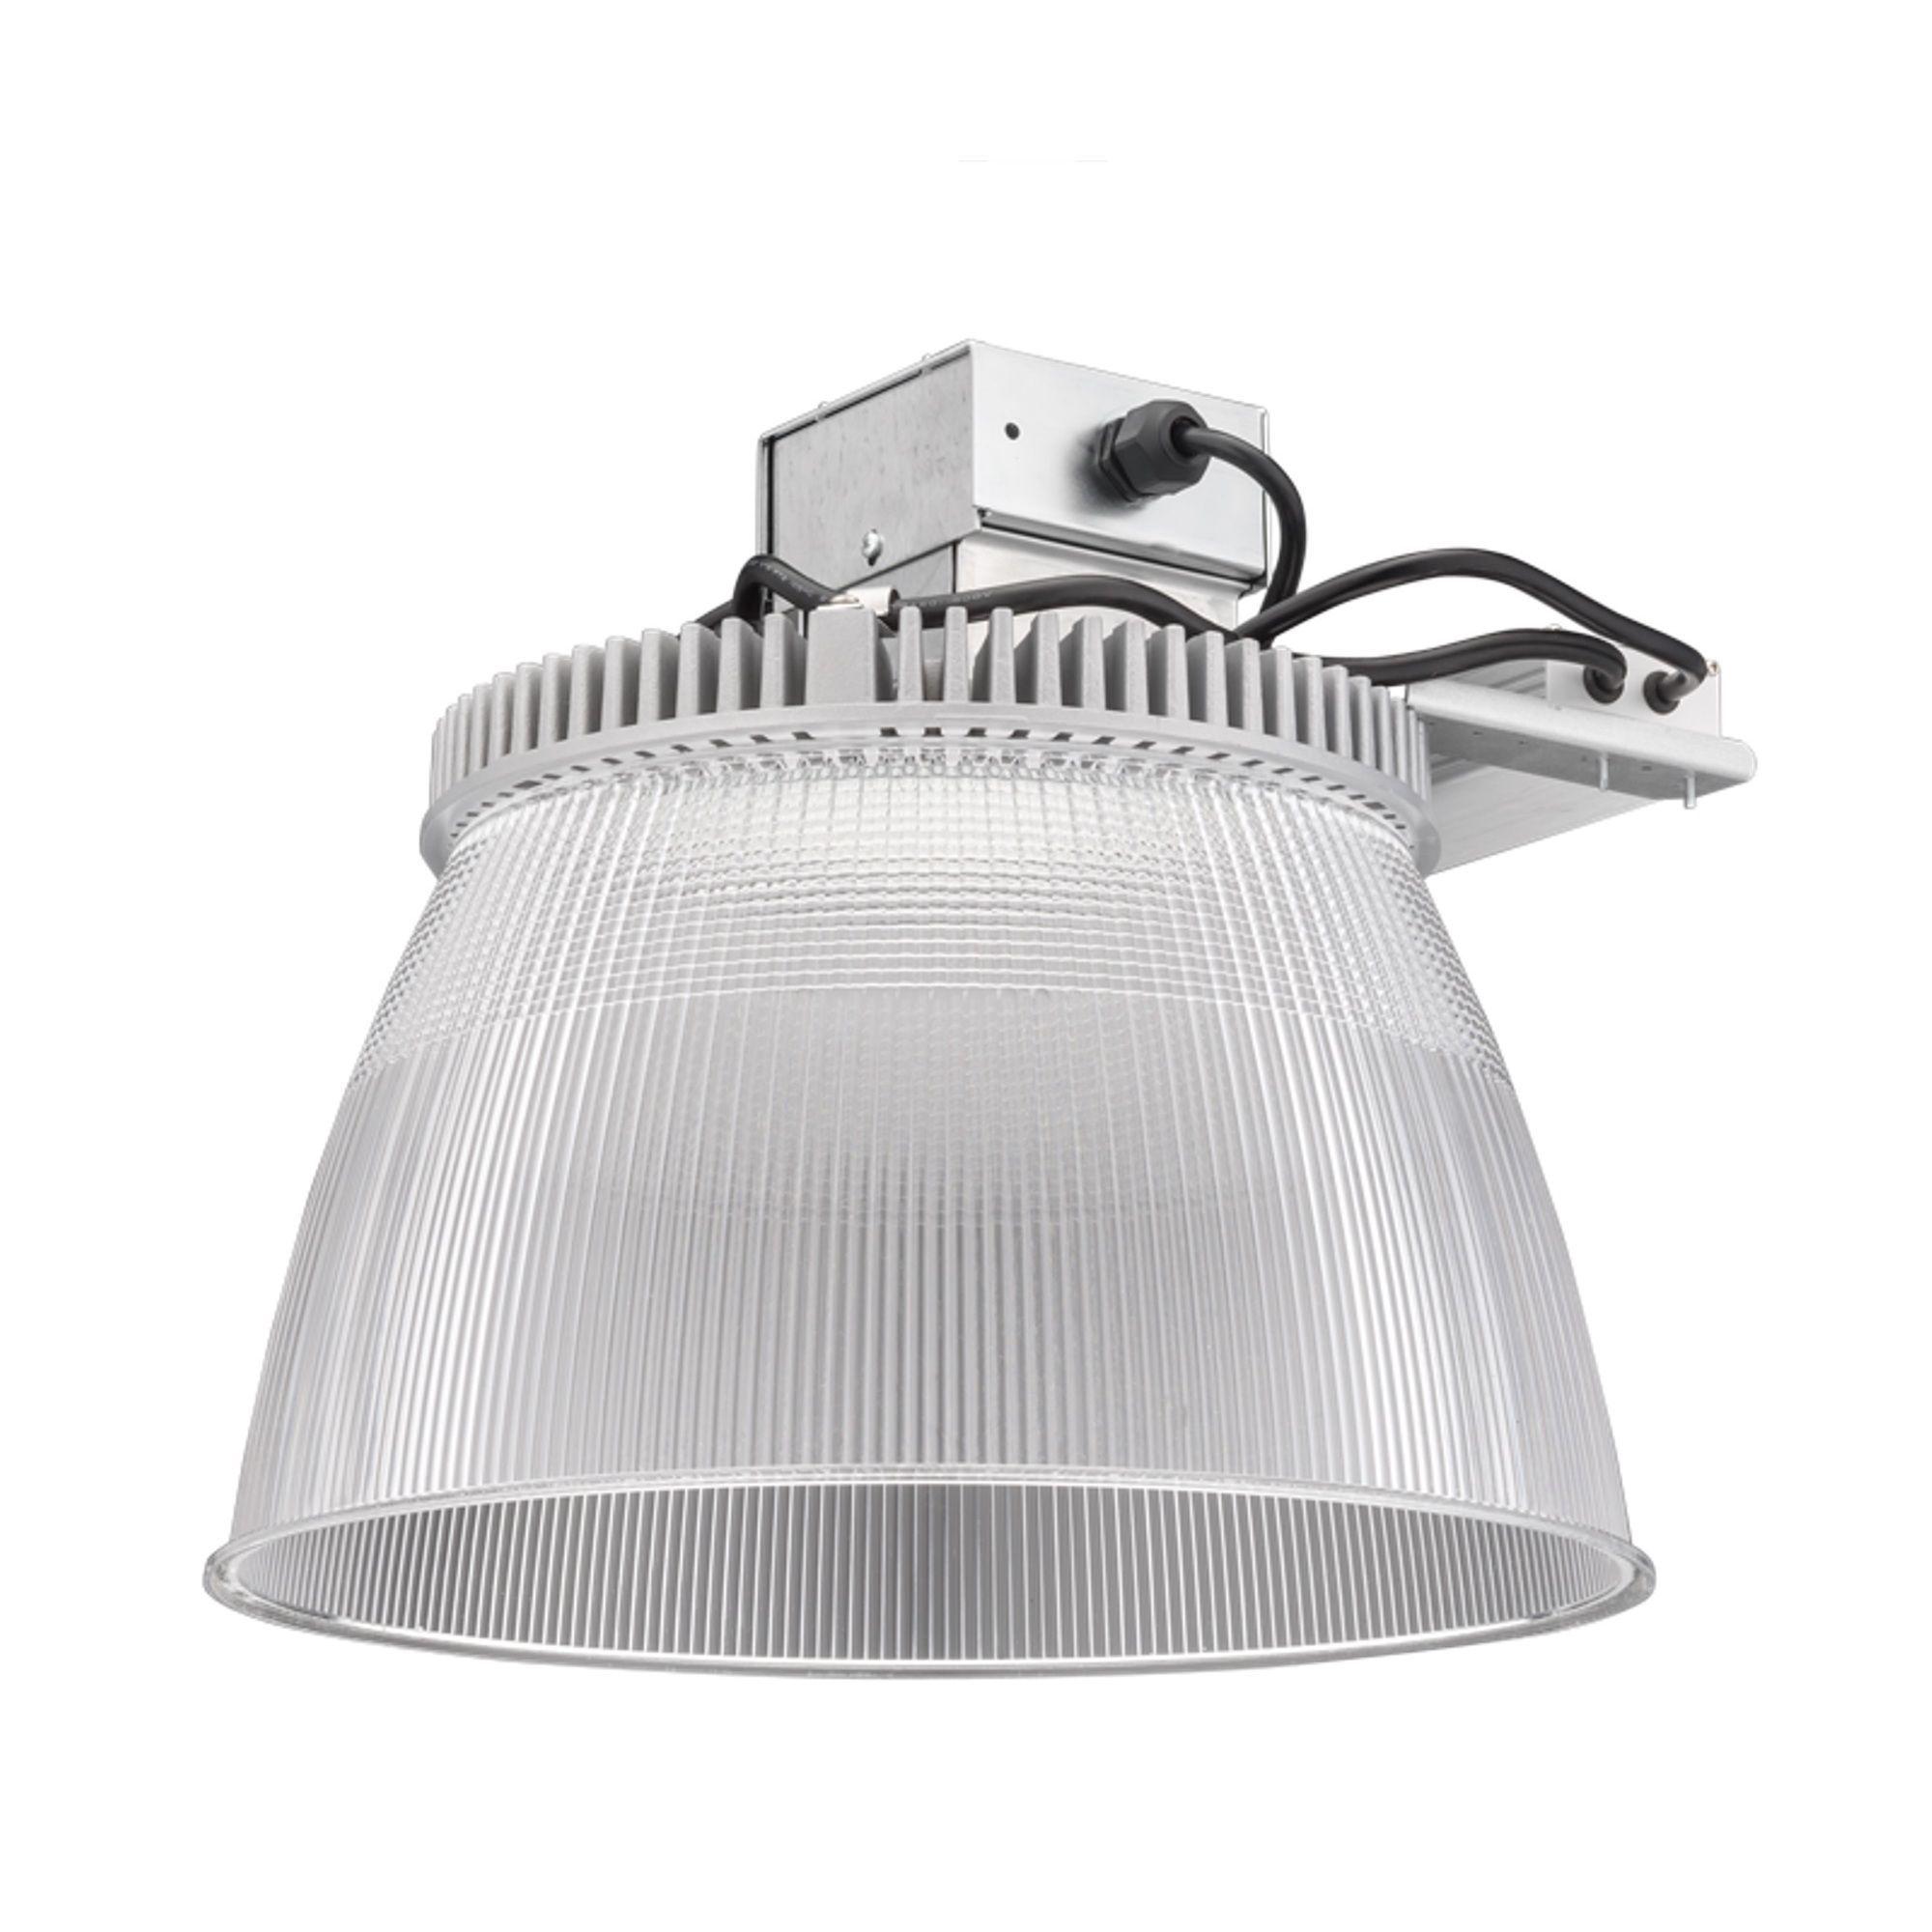 lithonia lighting jcbl 18000lm mvolt gz10 50k 70cri pm hc6 5000k